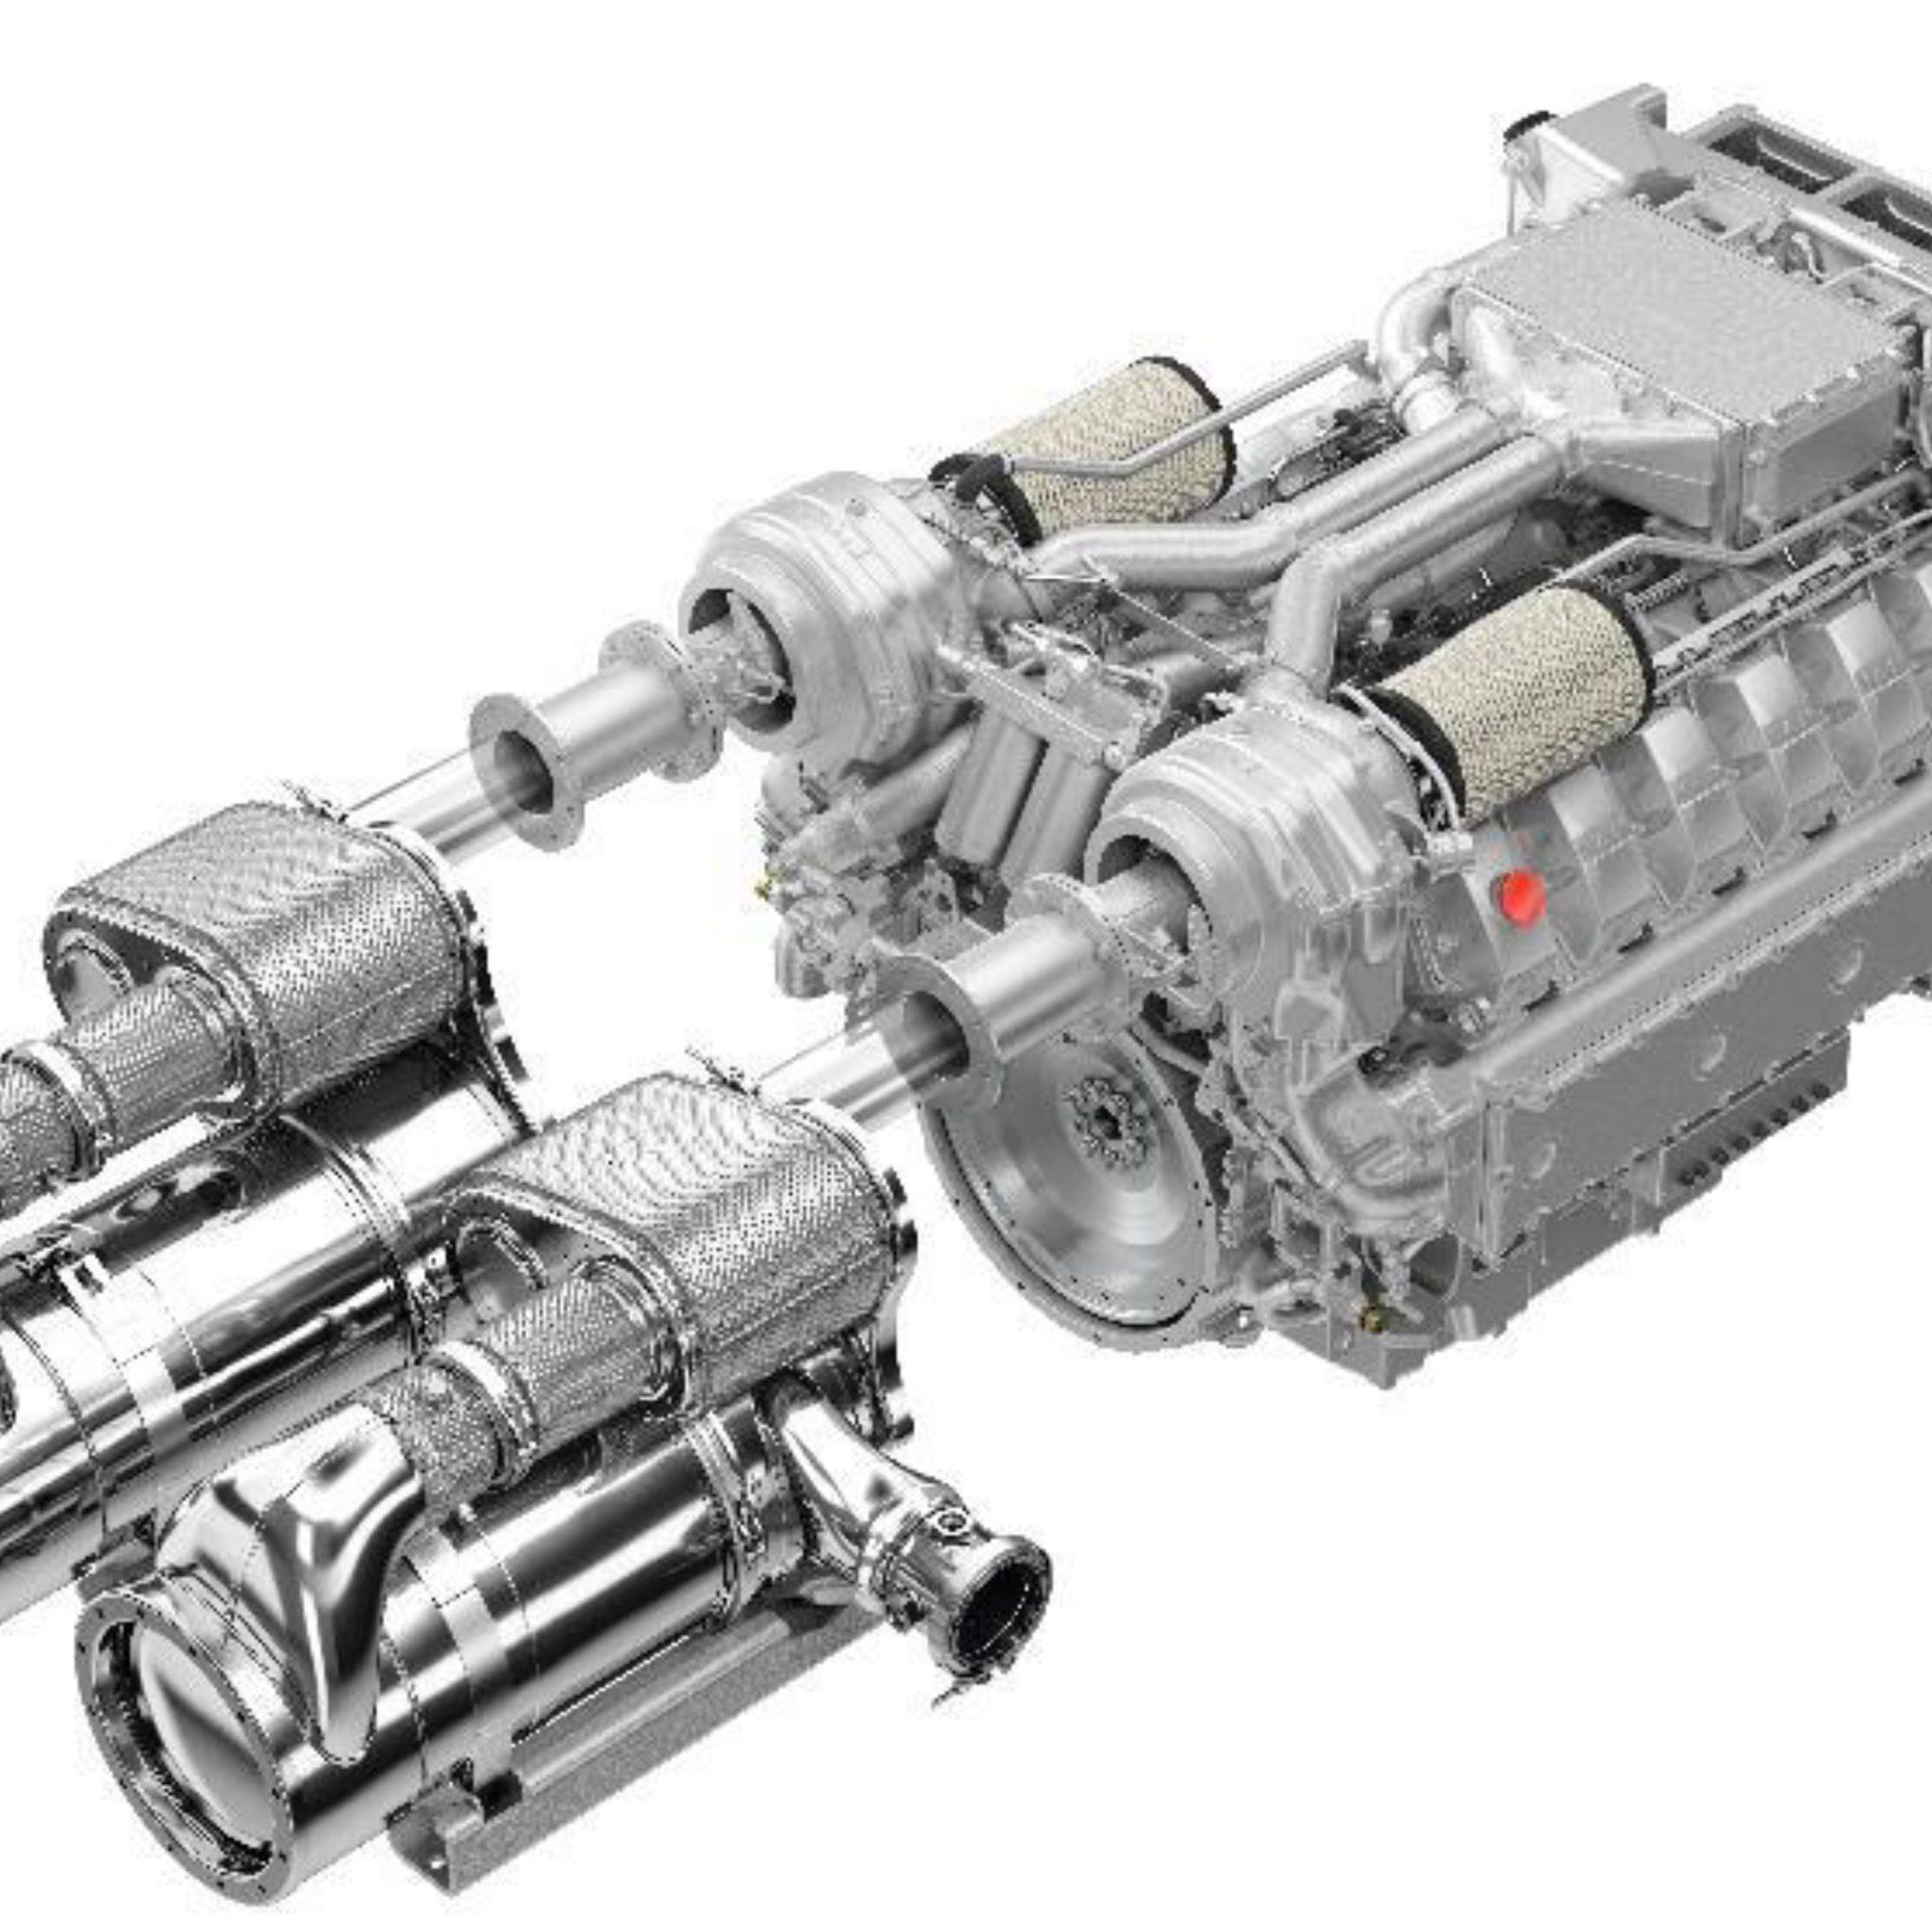 De MAN V12 IMO Tier III-motor. (Foto MAN)